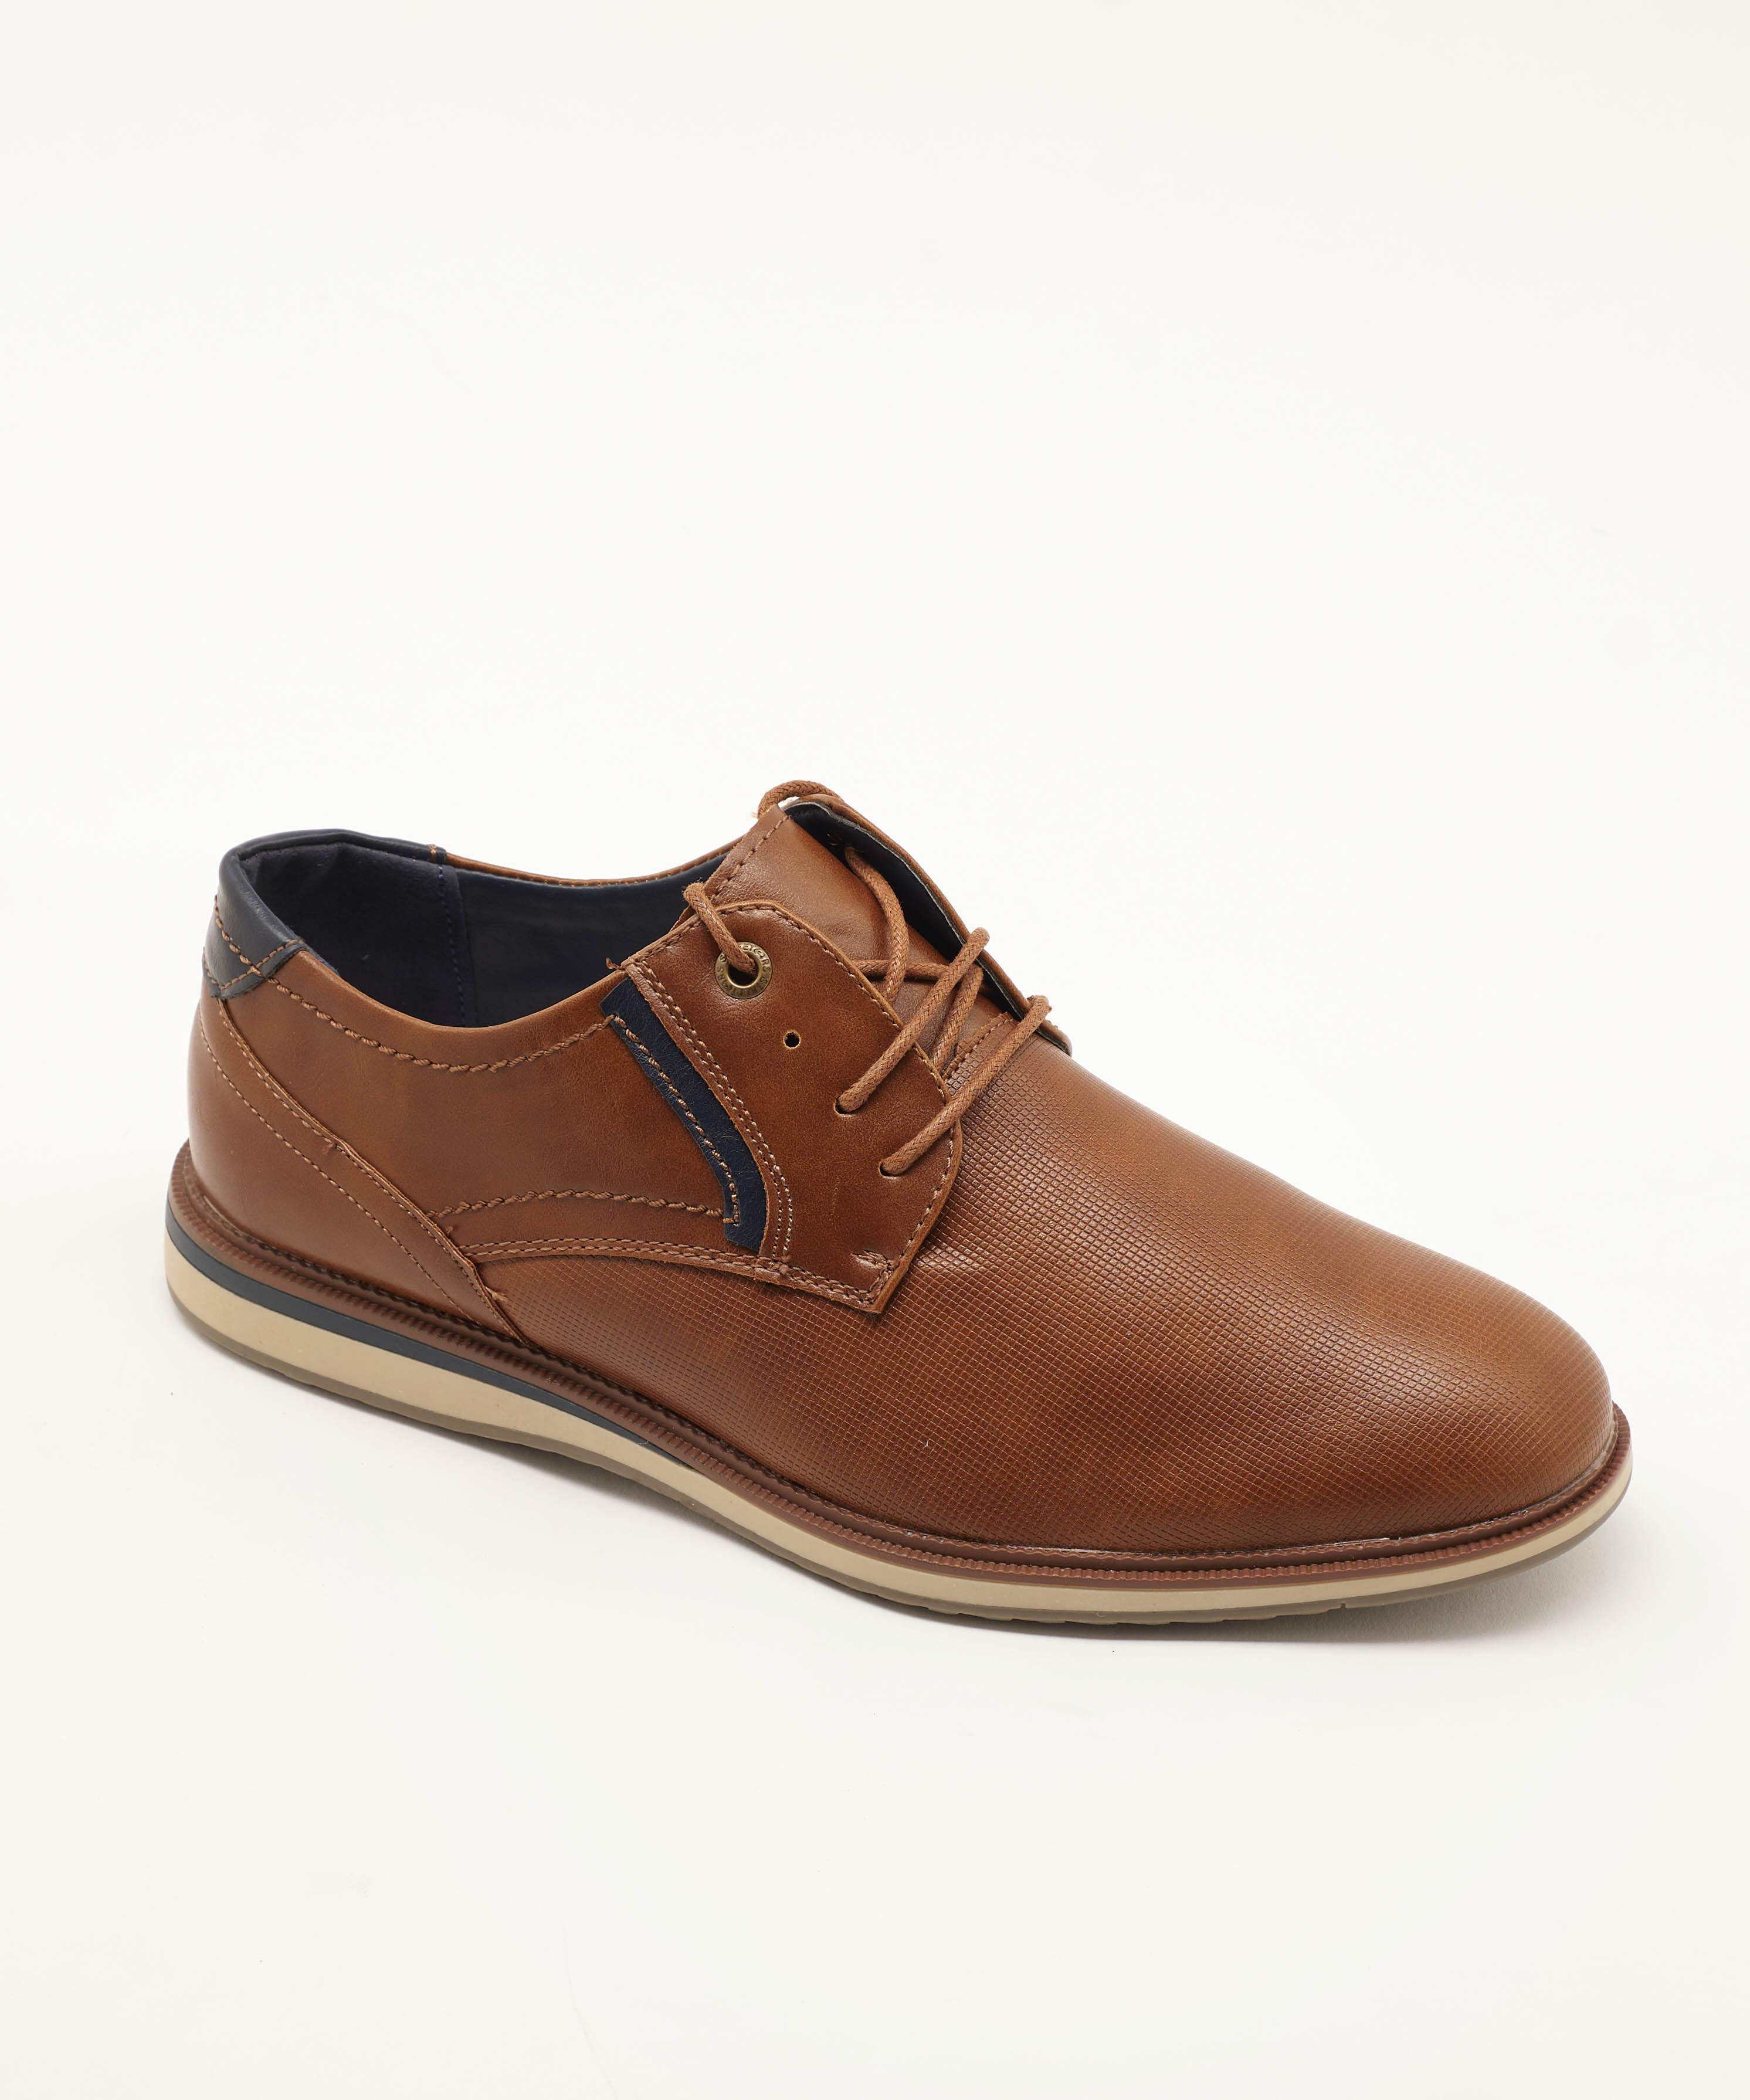 Chaussures De Ville Homme - Sneakers Camel Jina - X0022b